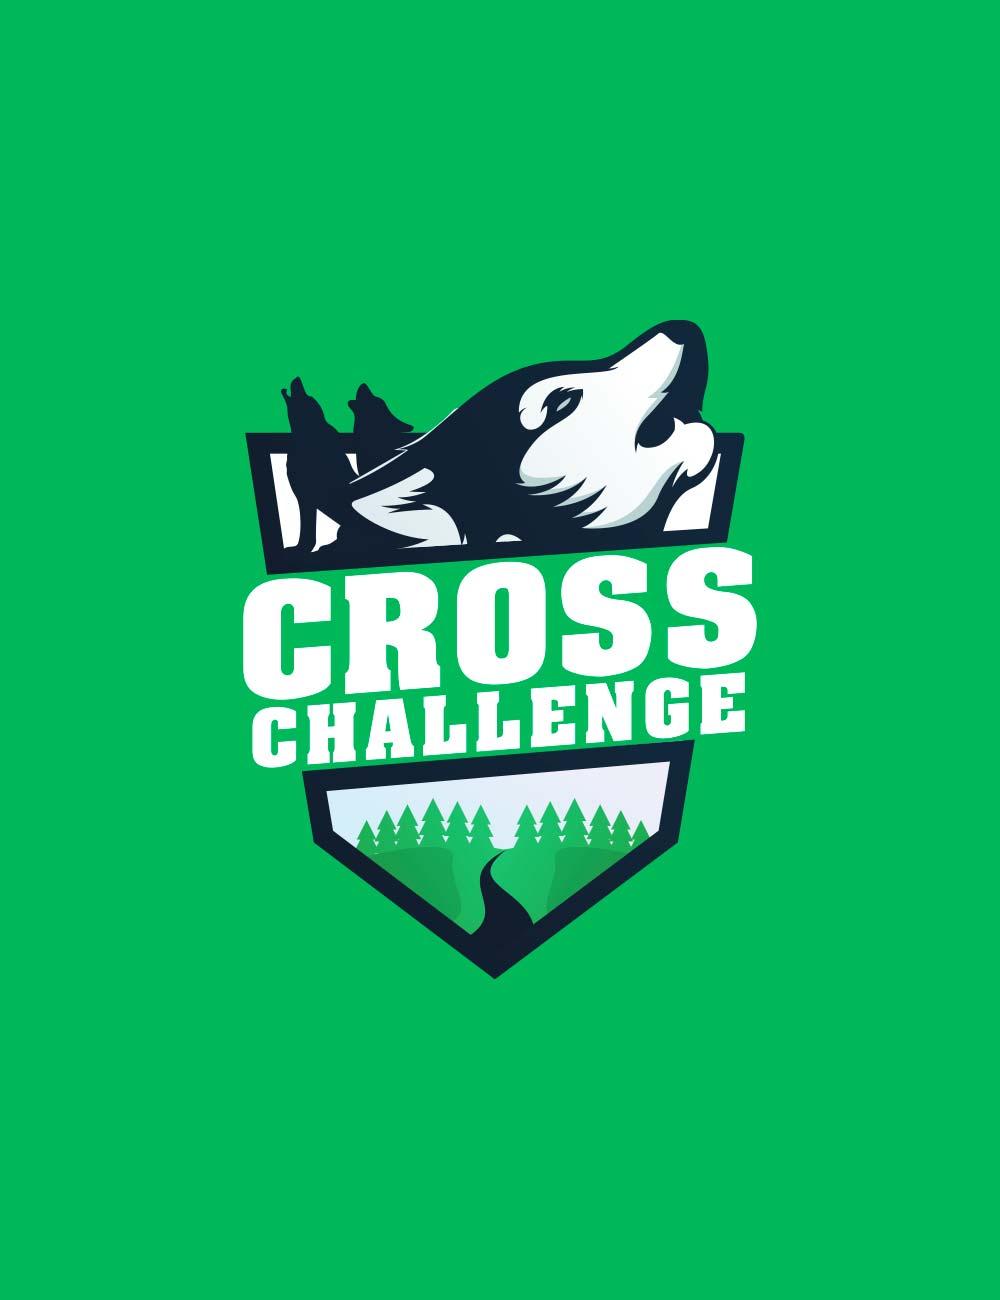 Cross Challenge - Brand identity